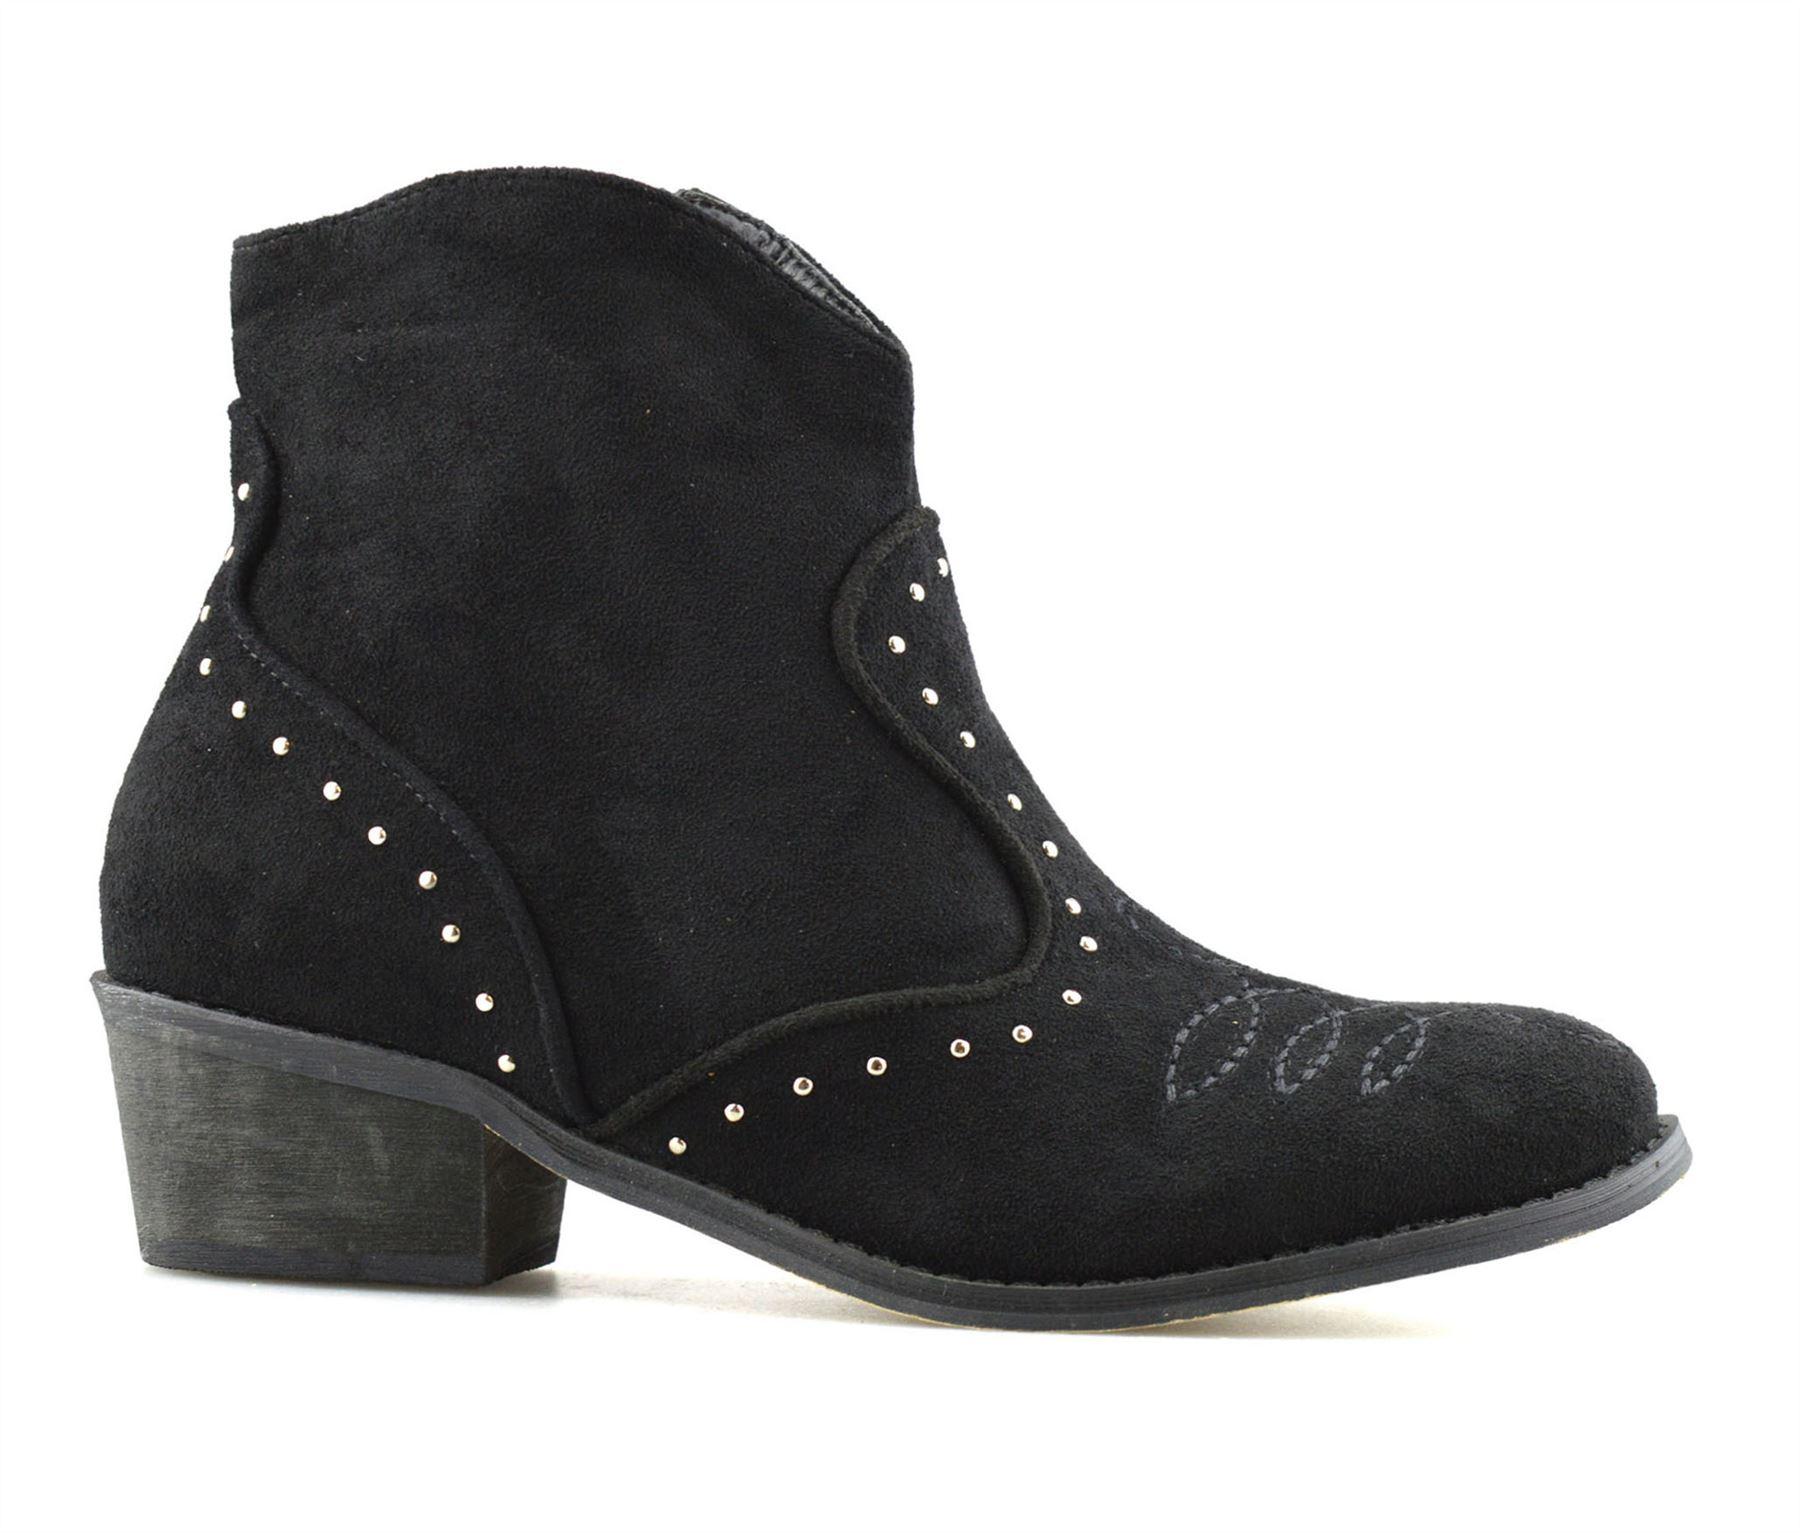 Ladies-Womens-Suede-Mid-Block-Heel-Zip-Up-Ankle-Cowboy-Biker-Boots-Shoes-Size thumbnail 13